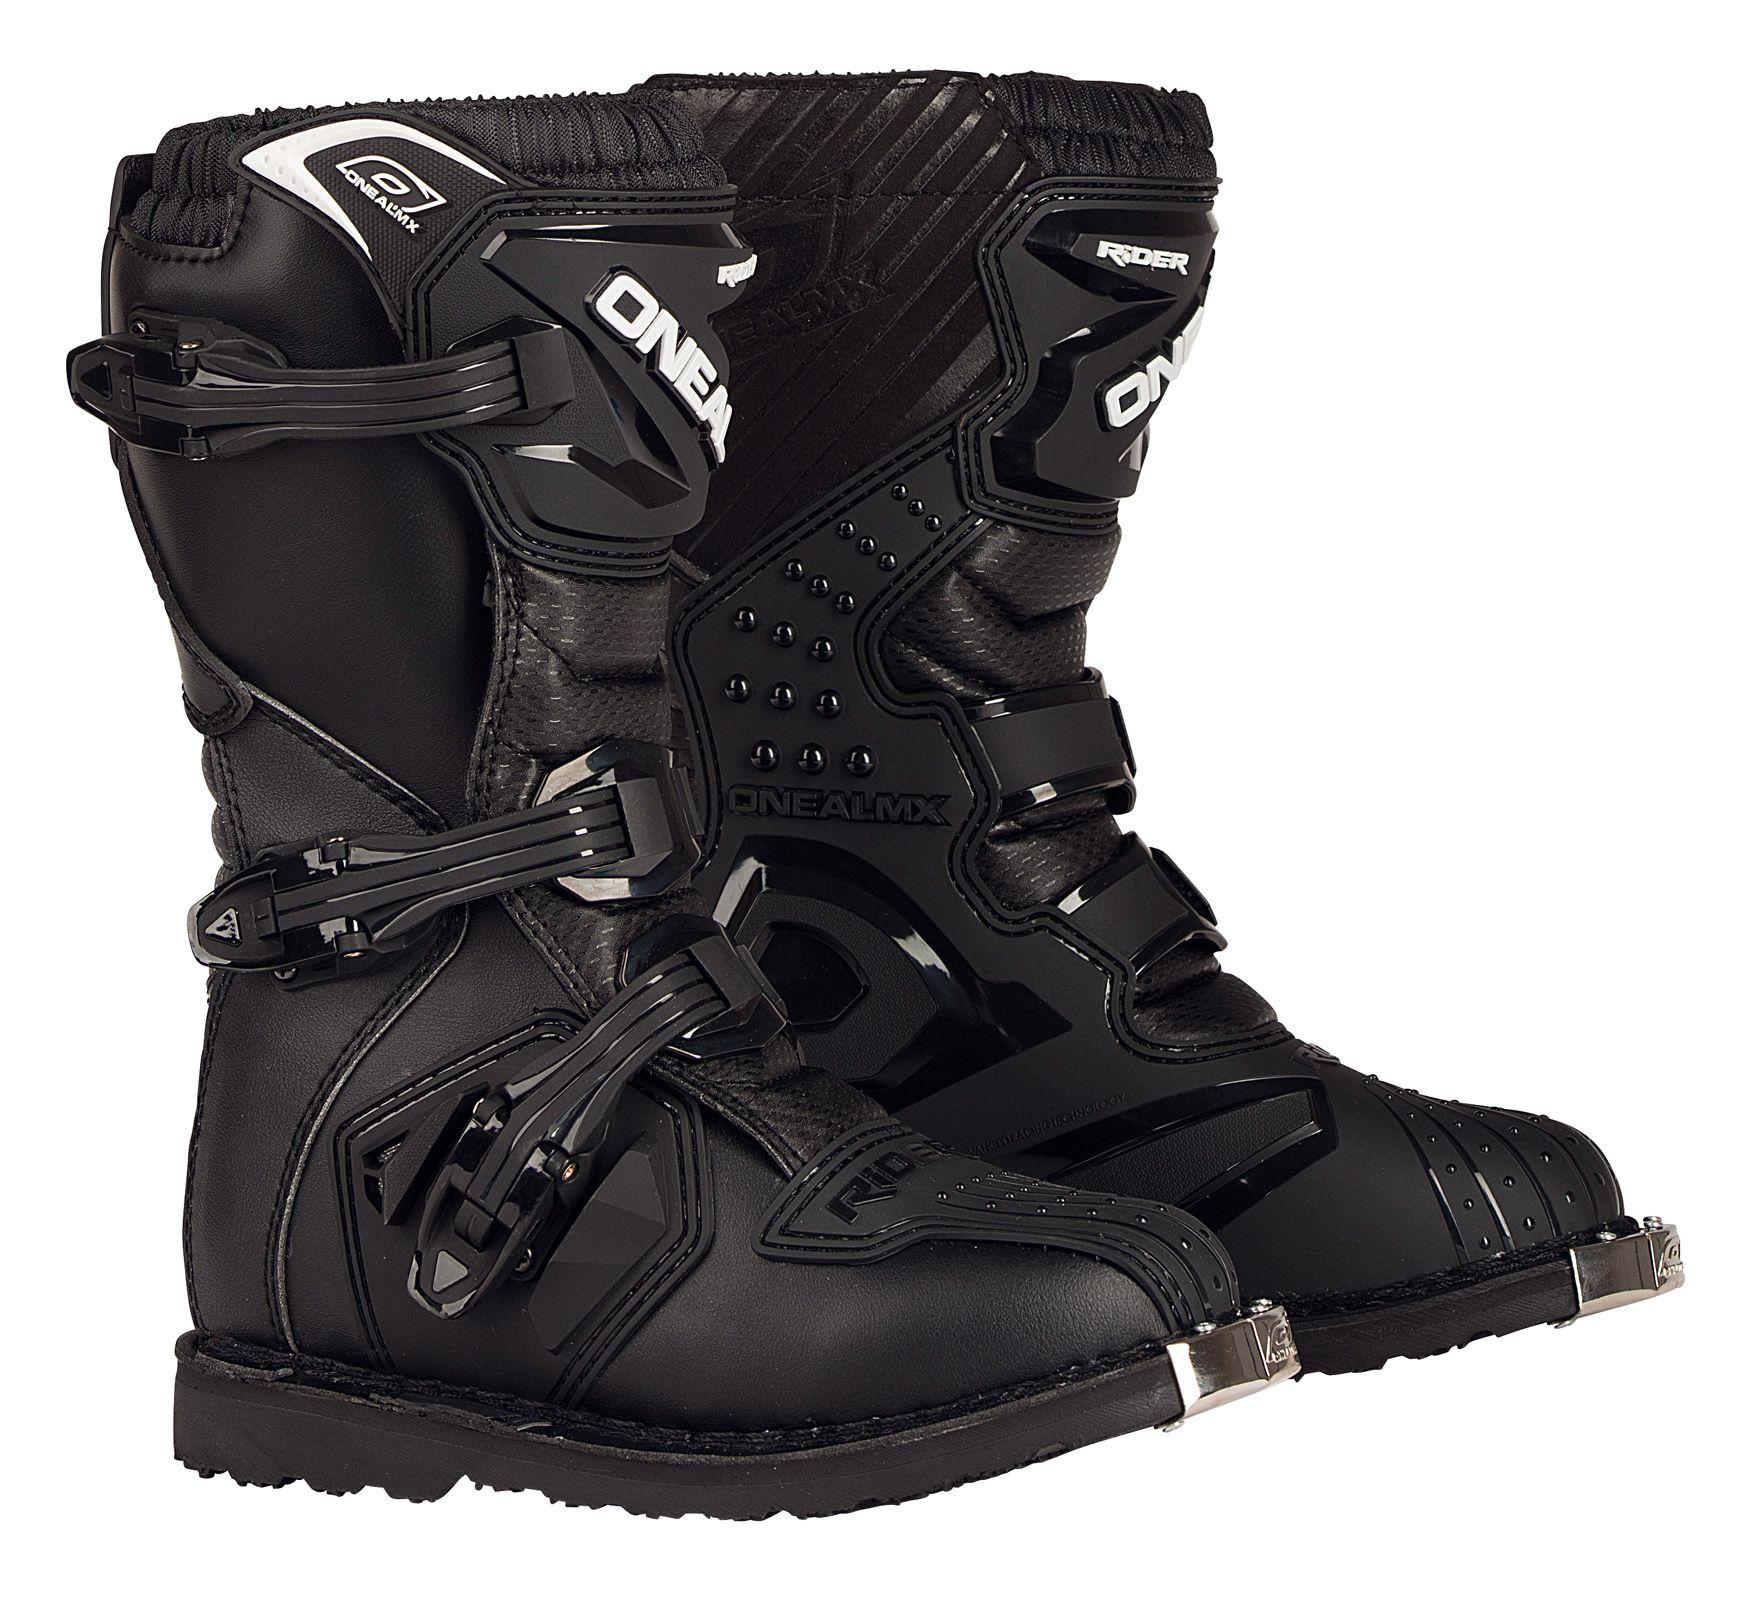 2015 Model RIDER Boots